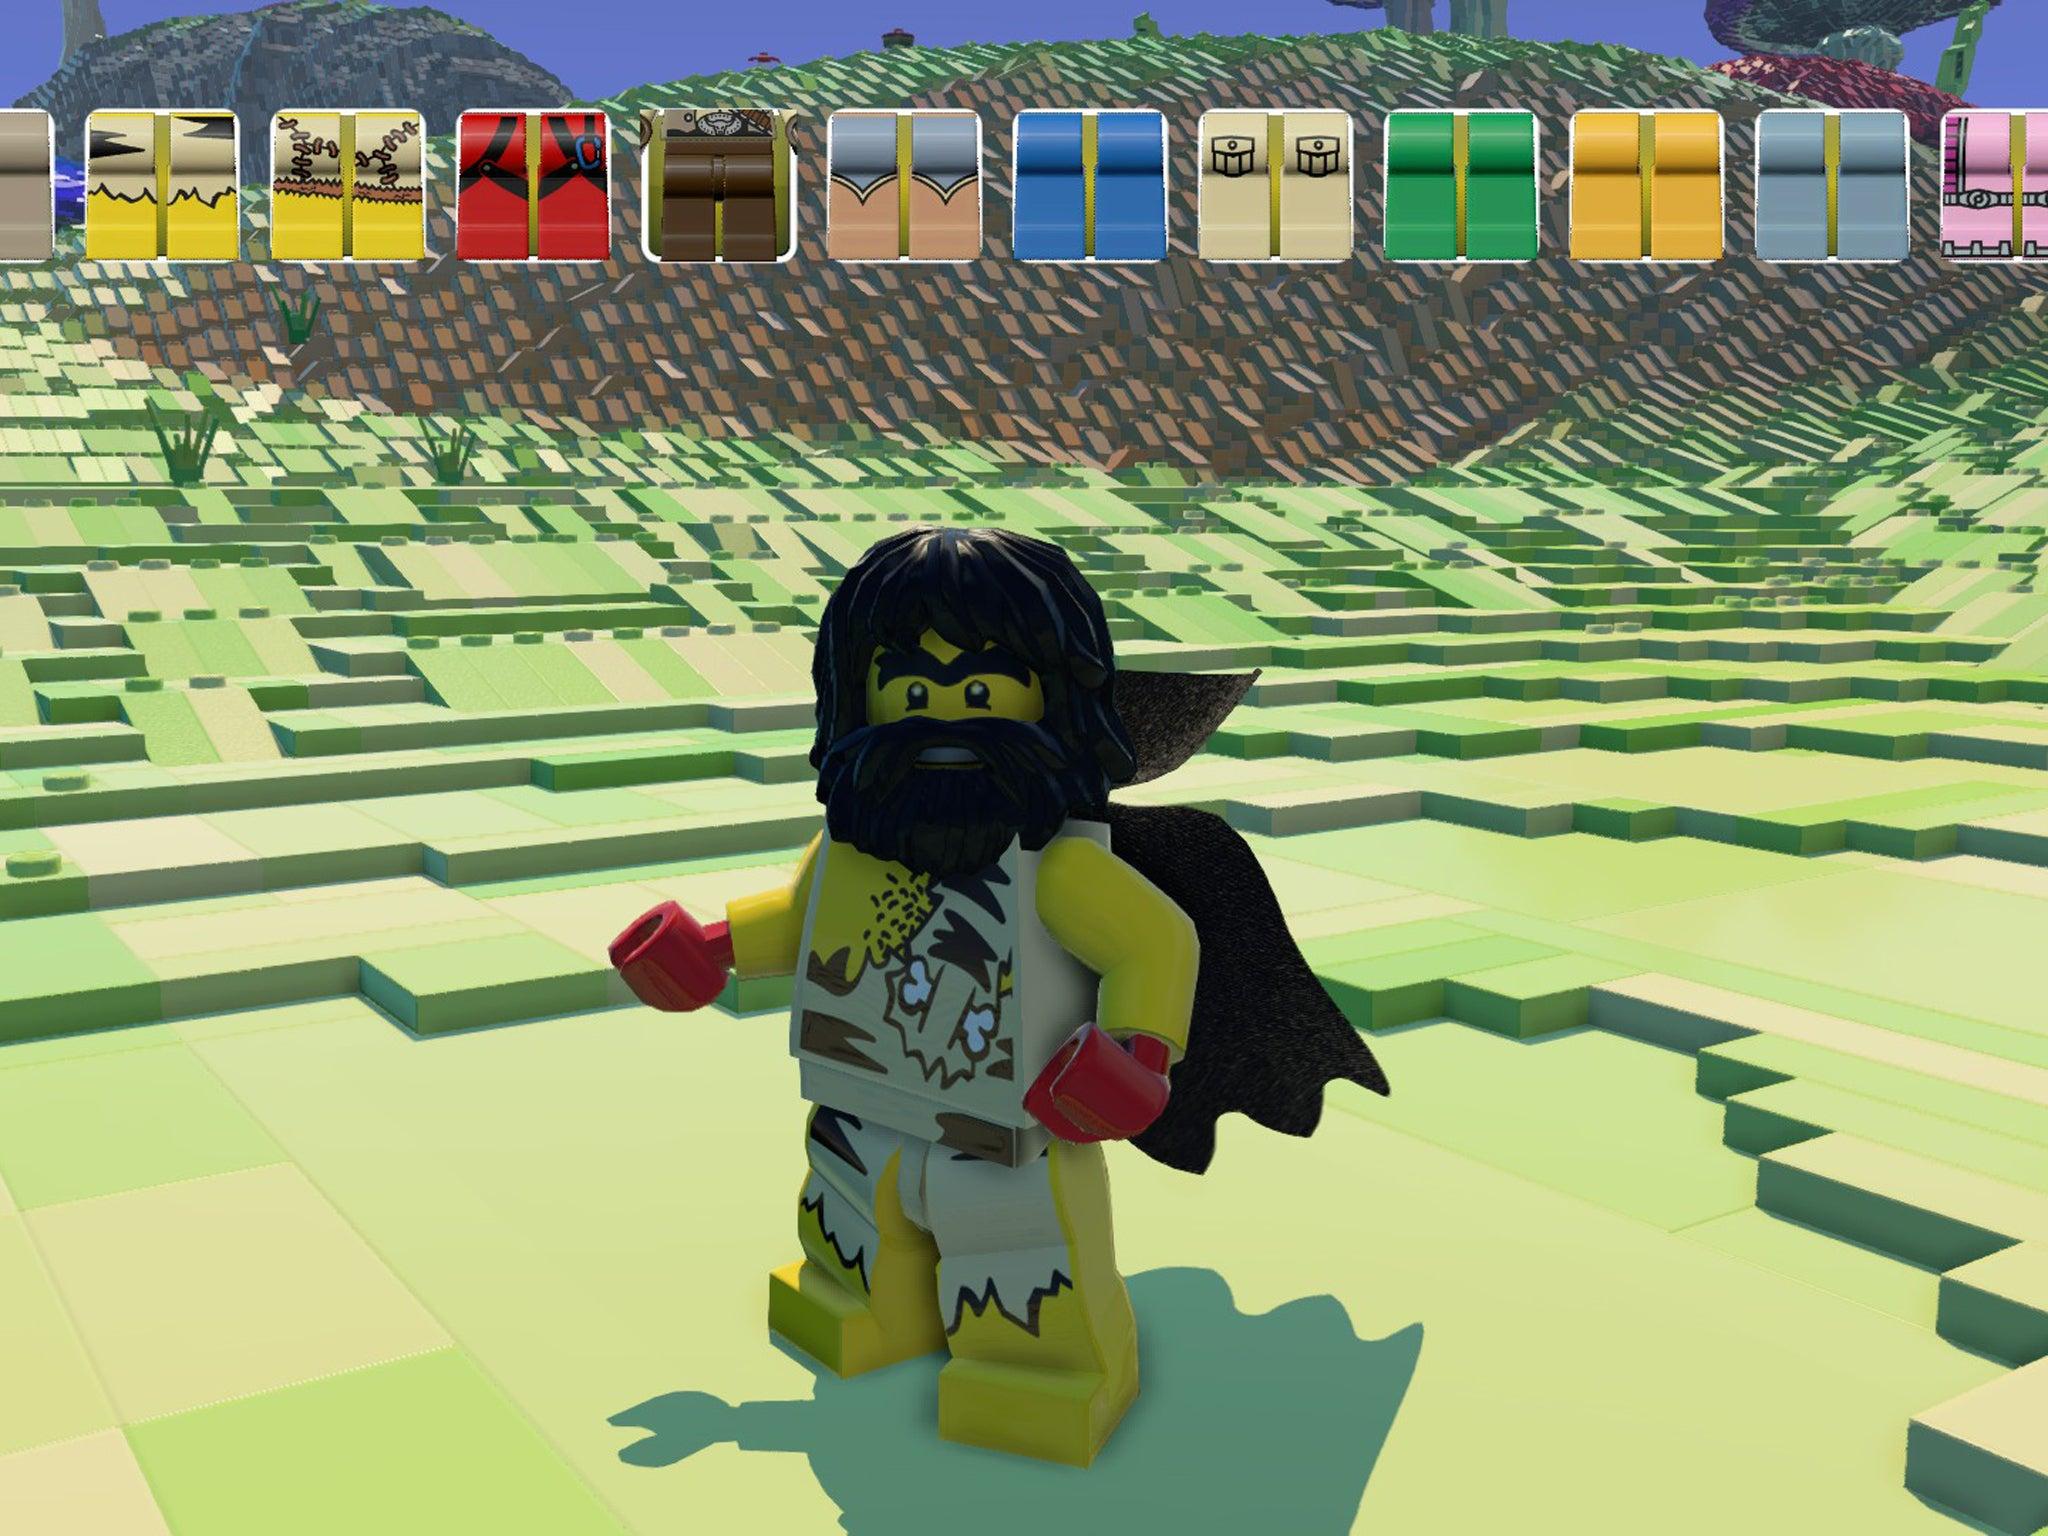 https://static.independent.co.uk/s3fs-public/thumbnails/image/2015/06/02/15/lego-worlds.jpg